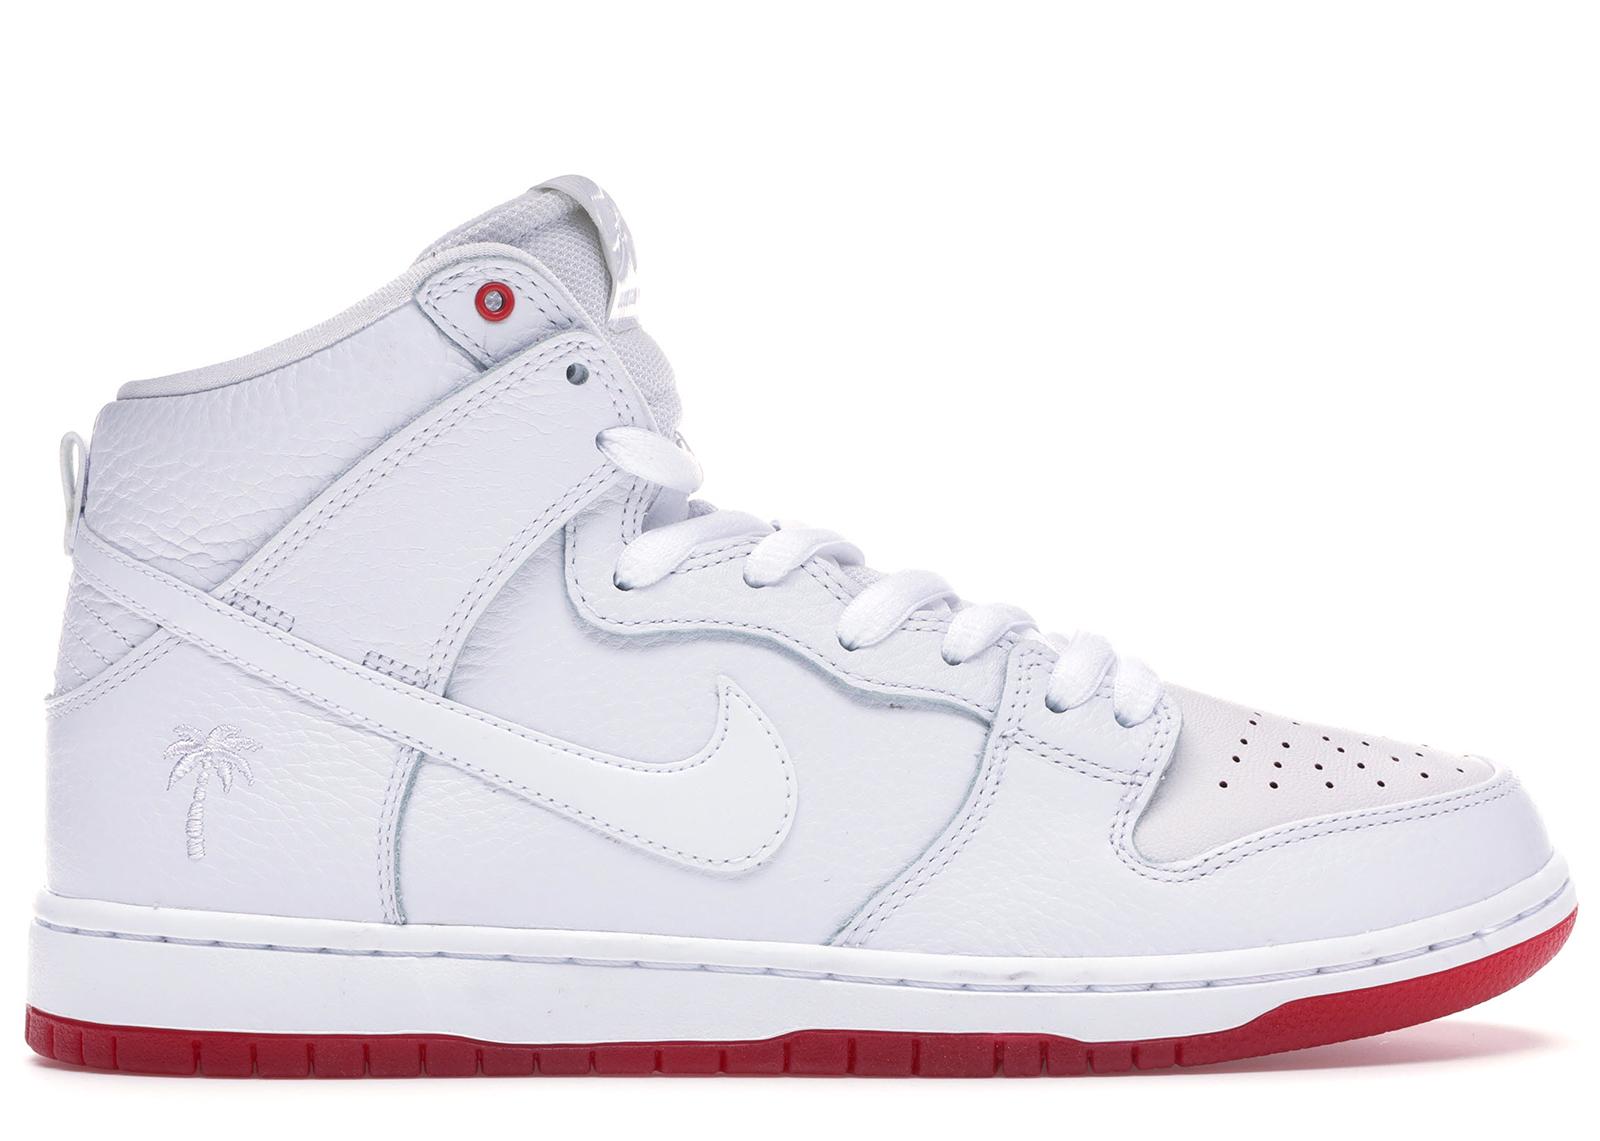 Nike SB Dunk High Kevin Bradley